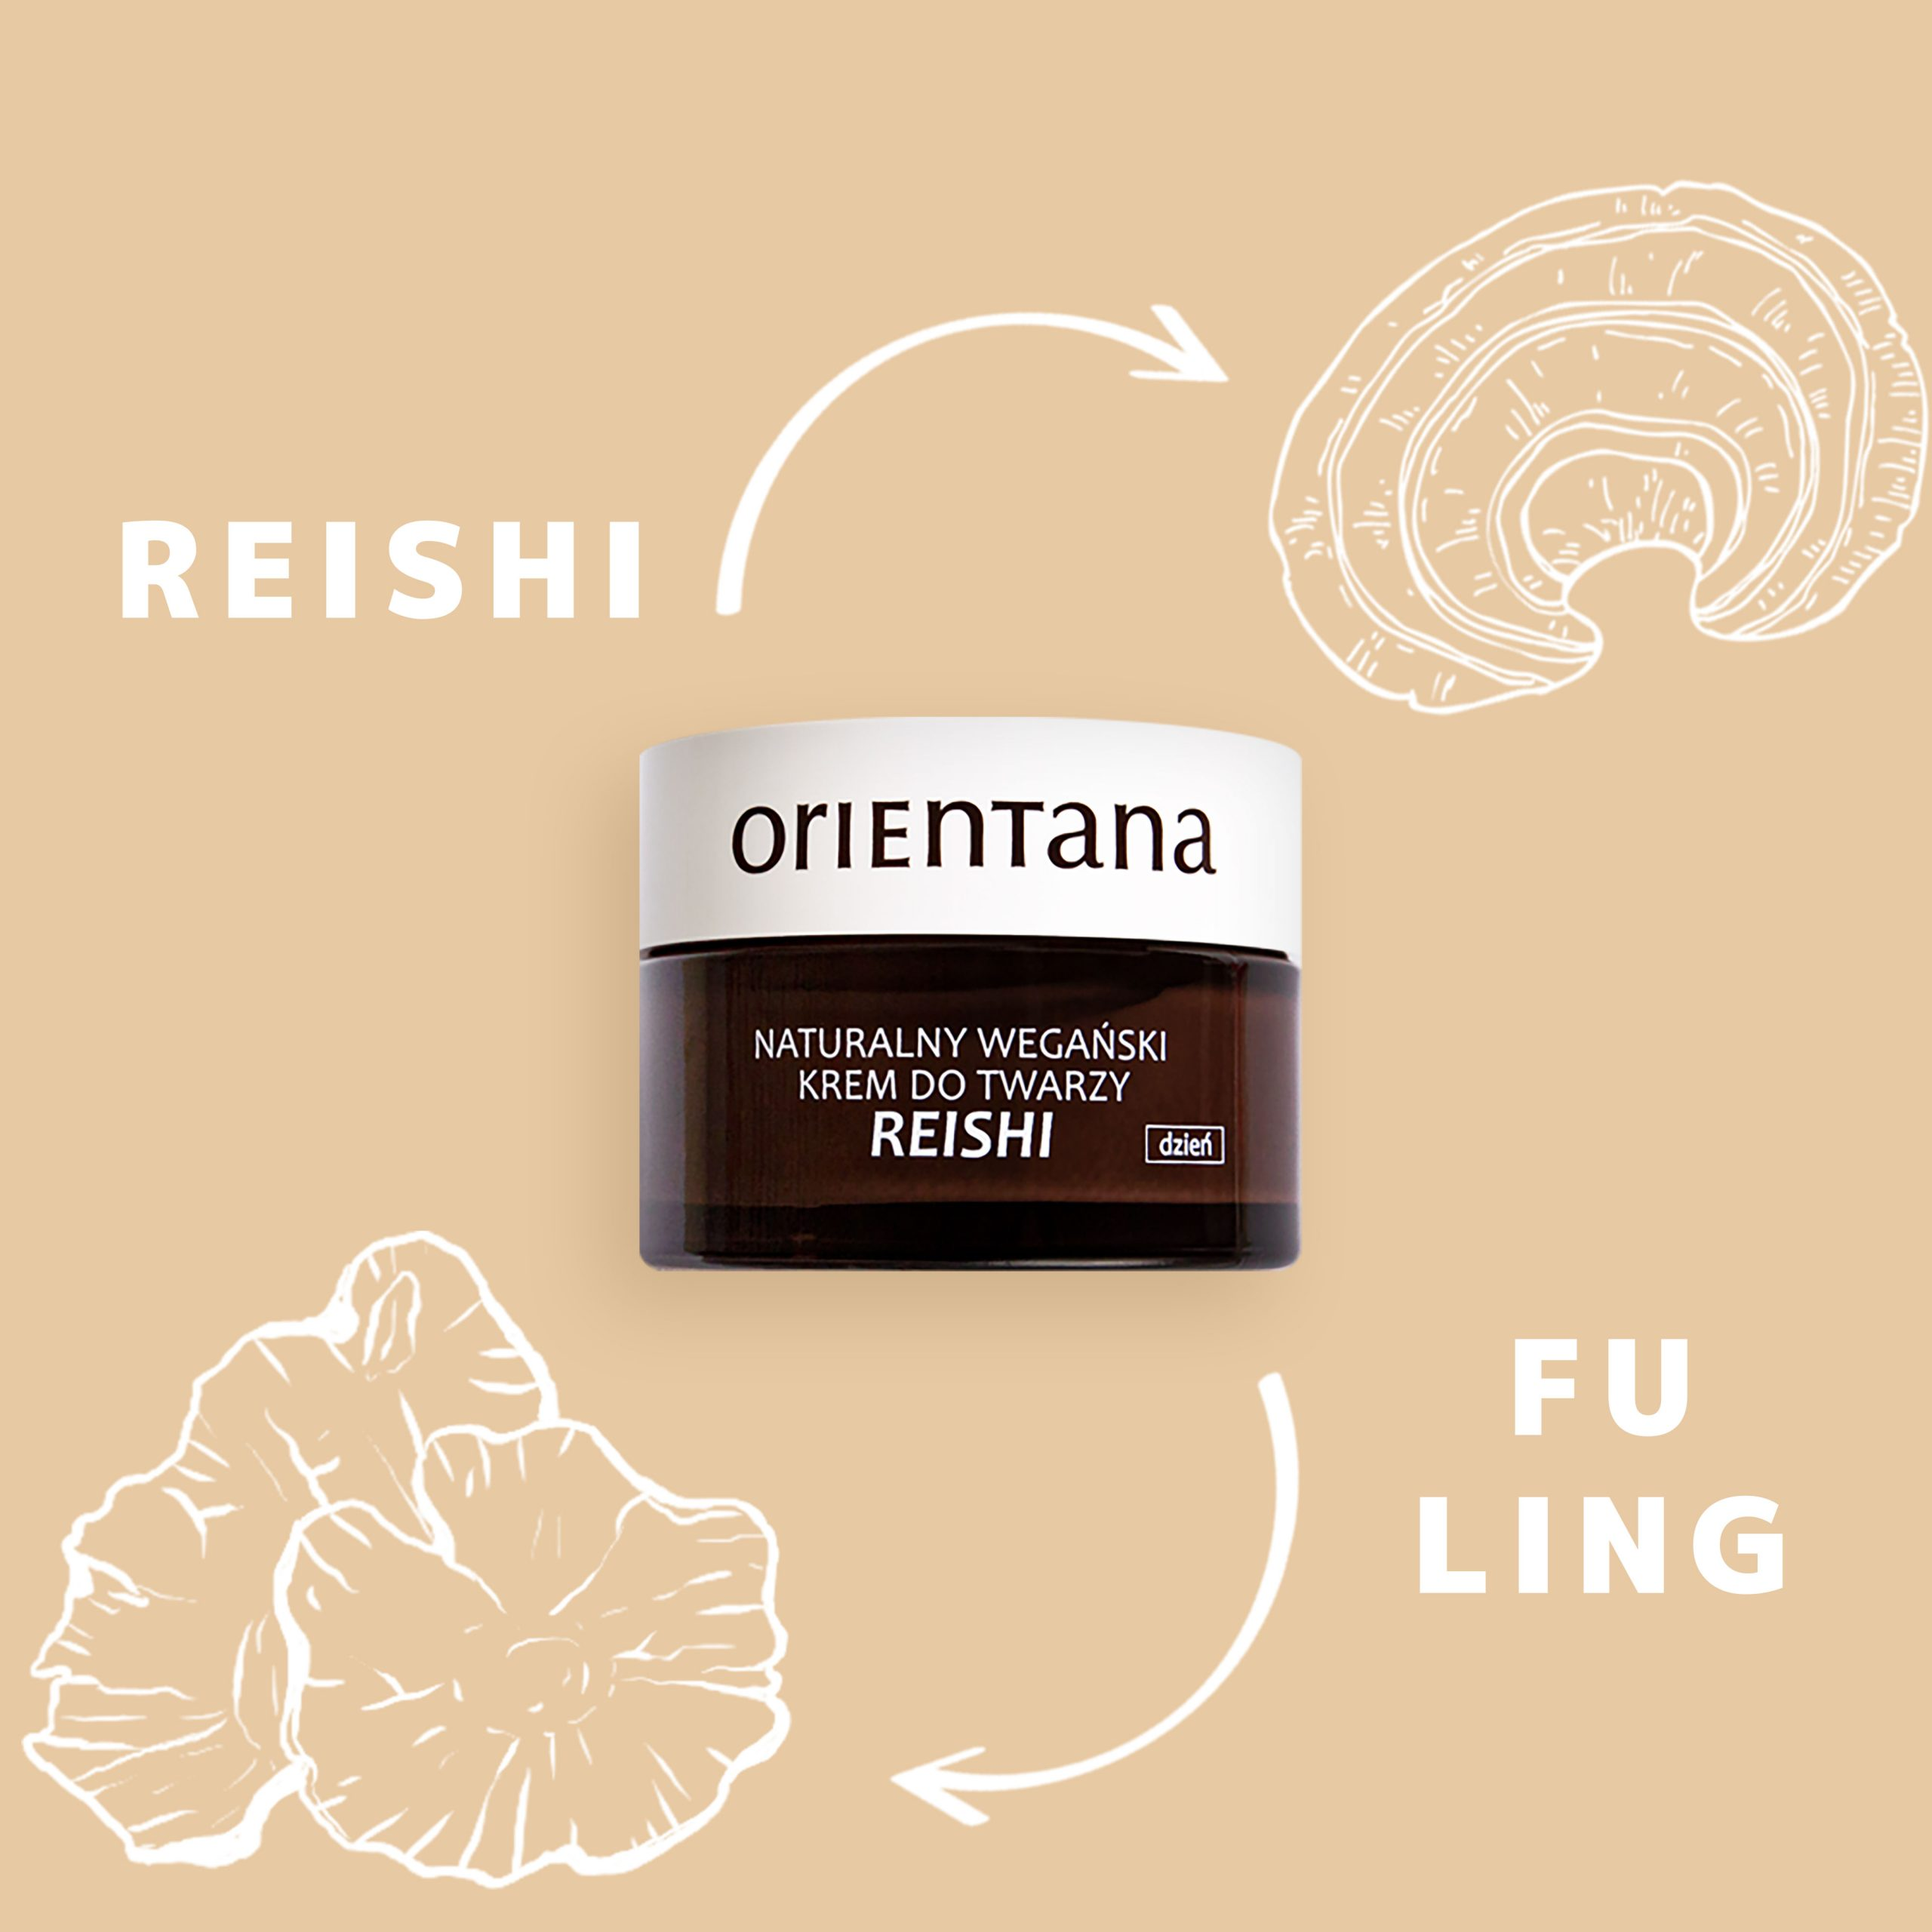 Reishi Natural Vegan Day Cream